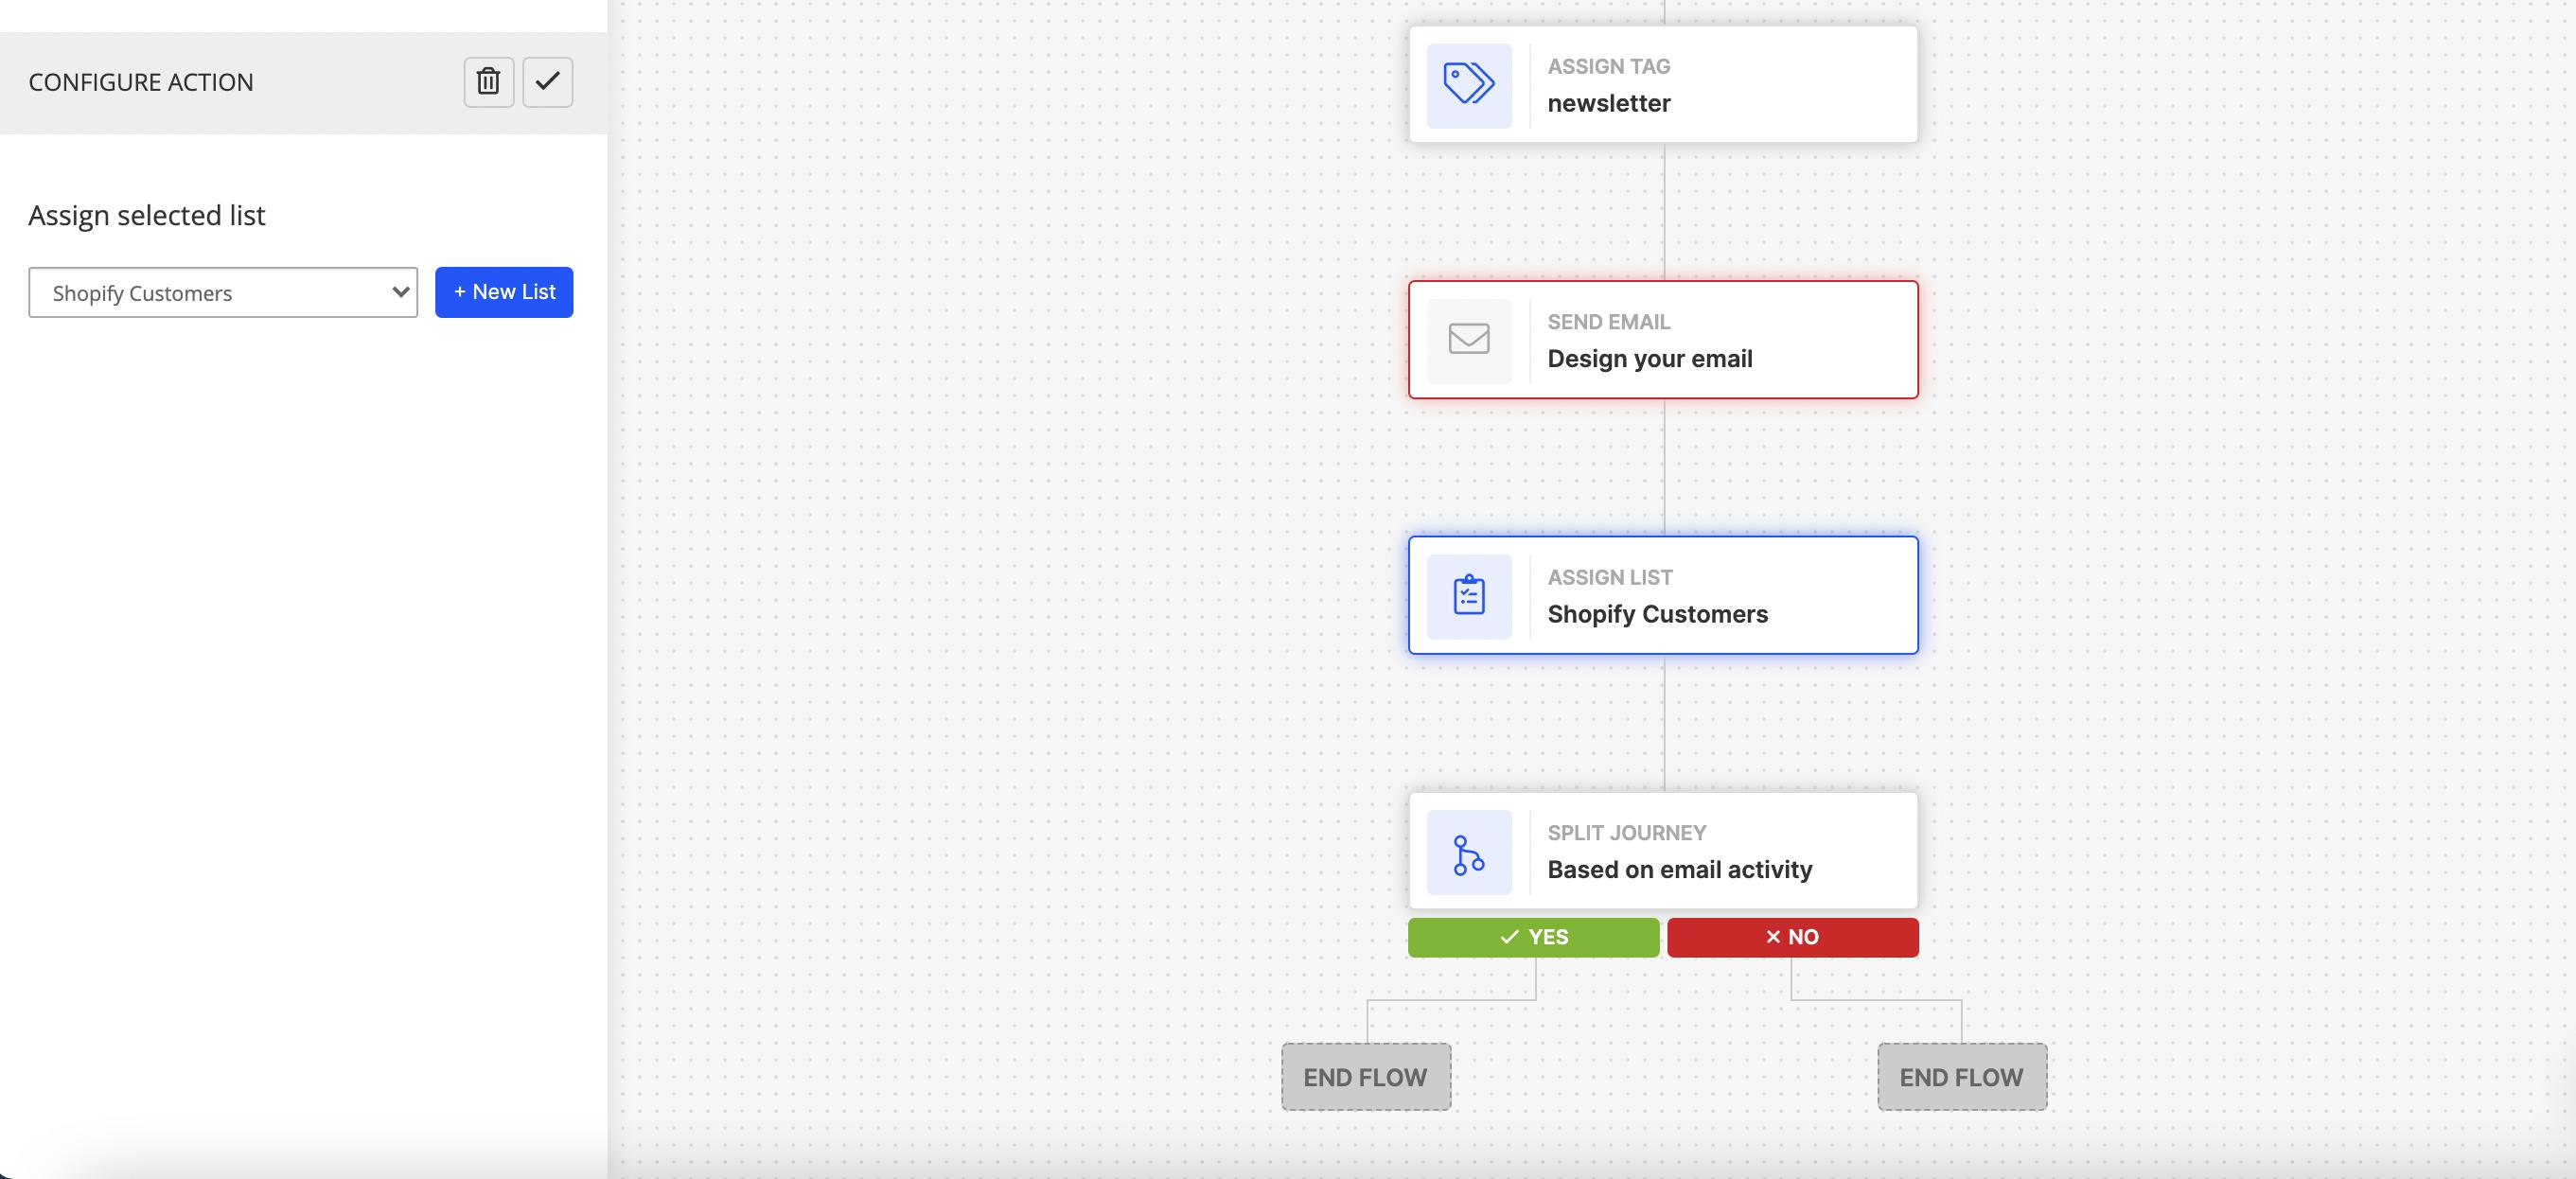 add custom delays, journey splits in the app